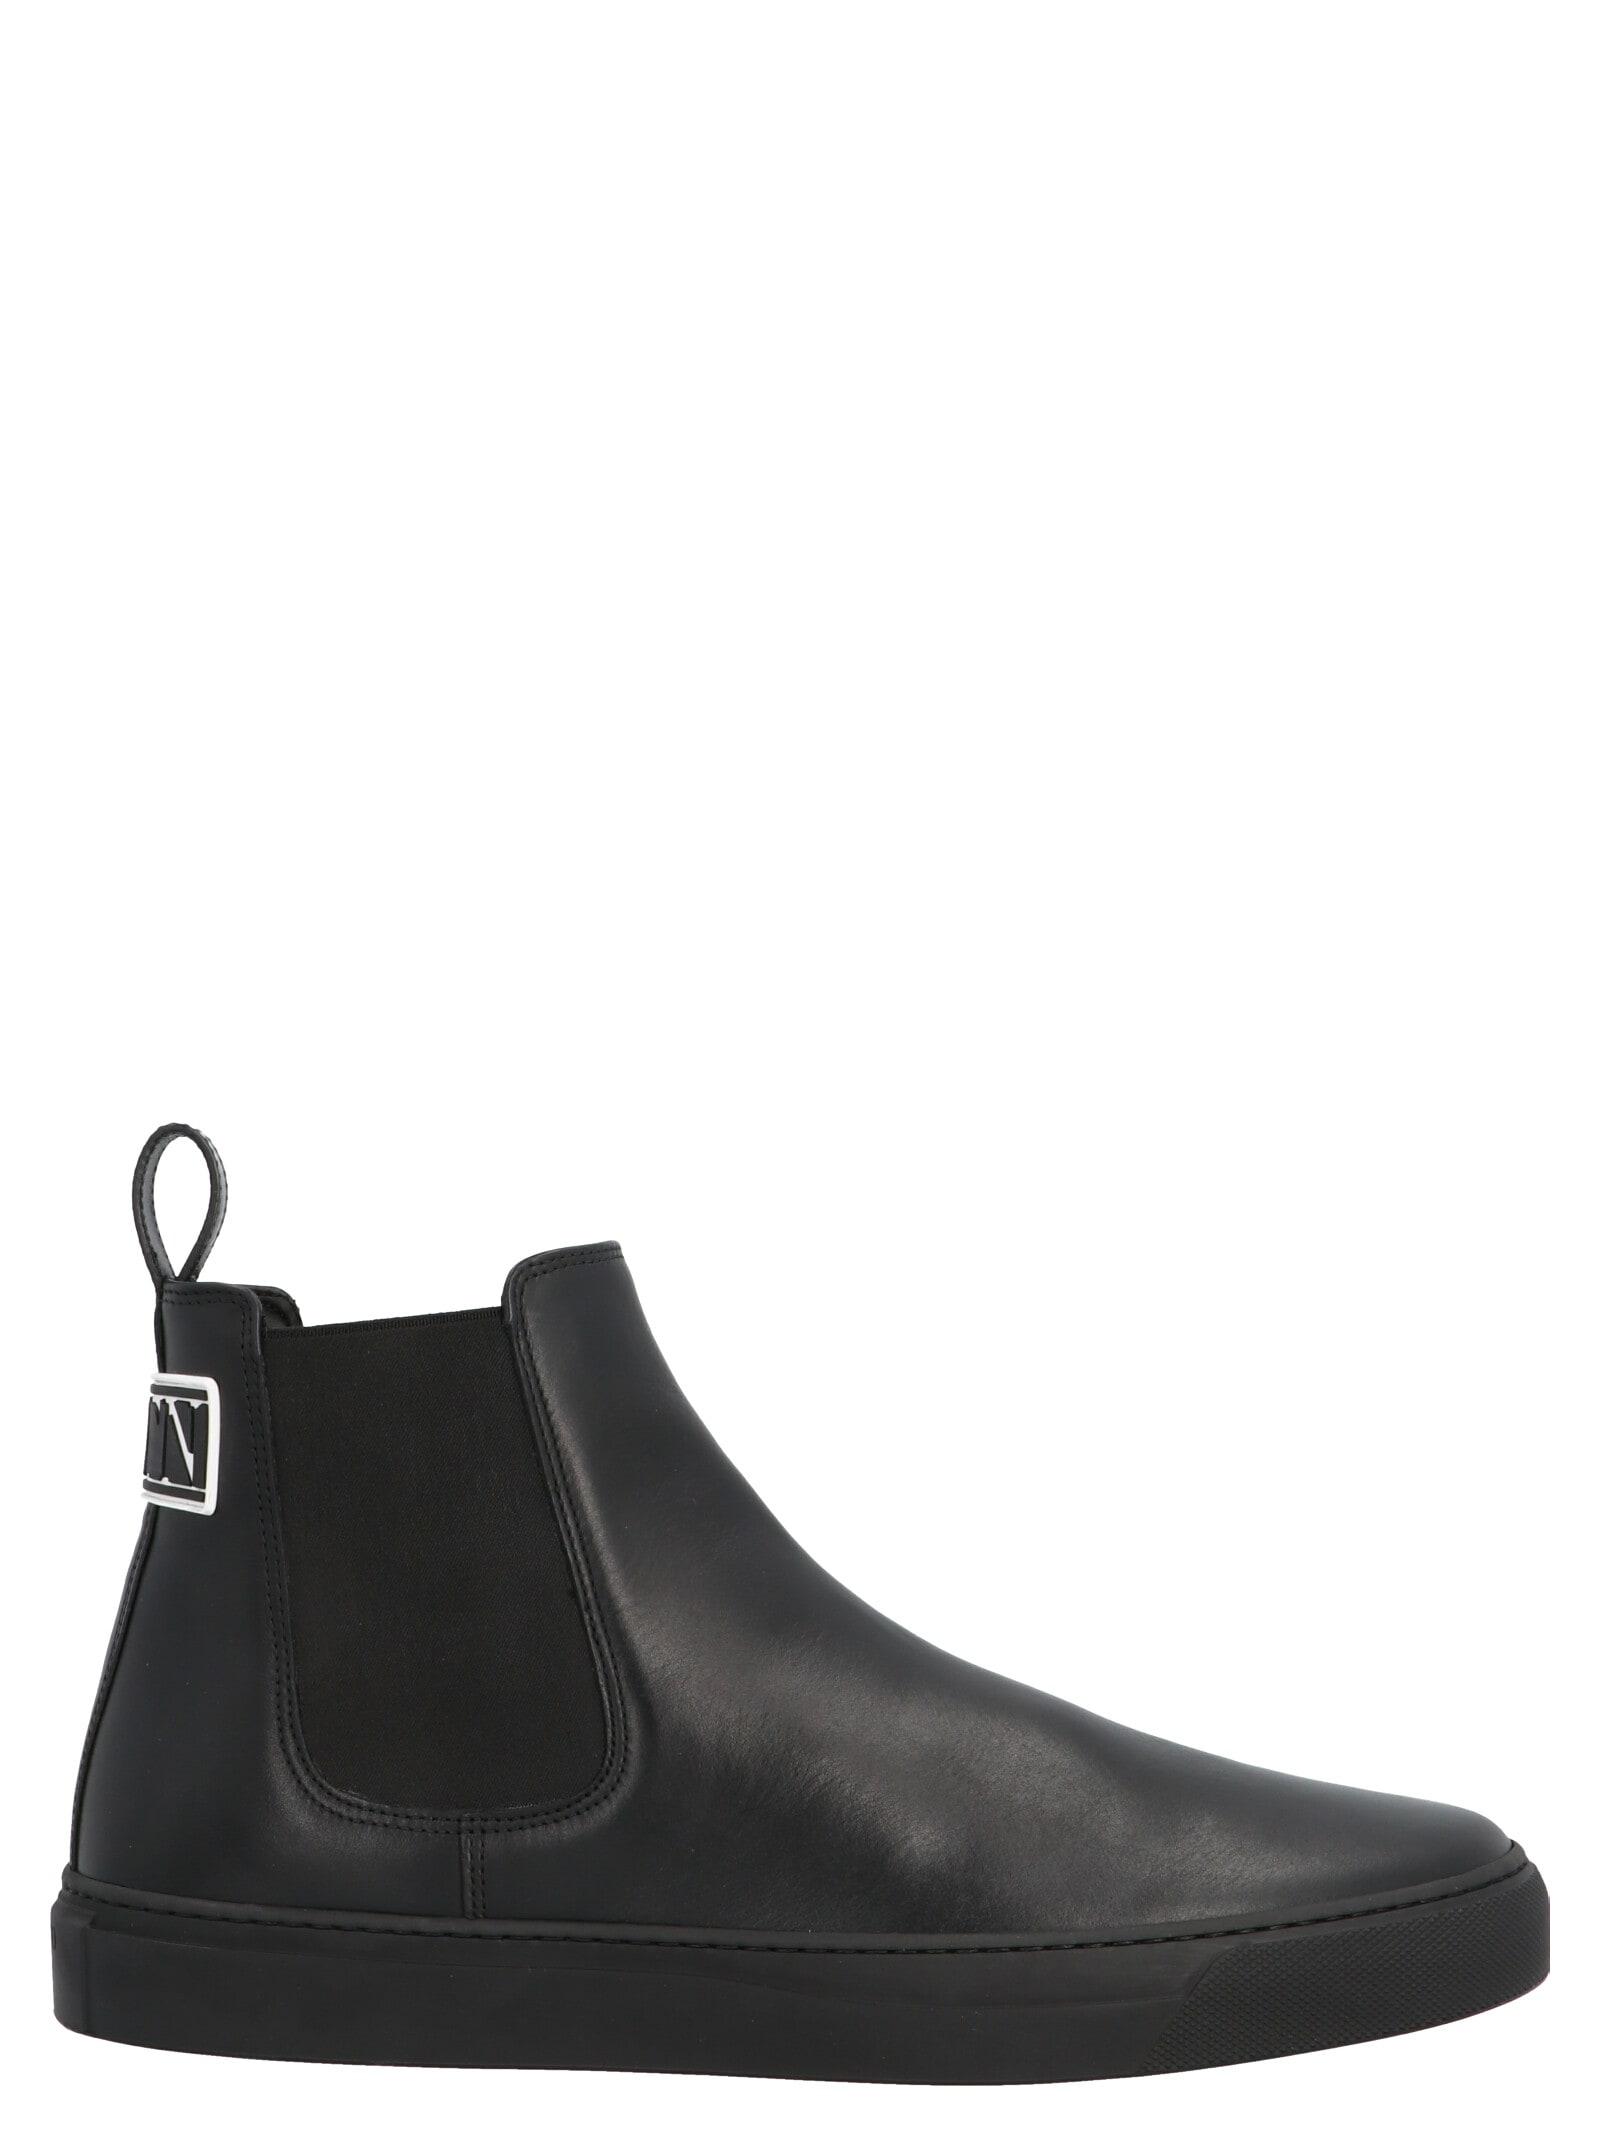 vltn Shoes